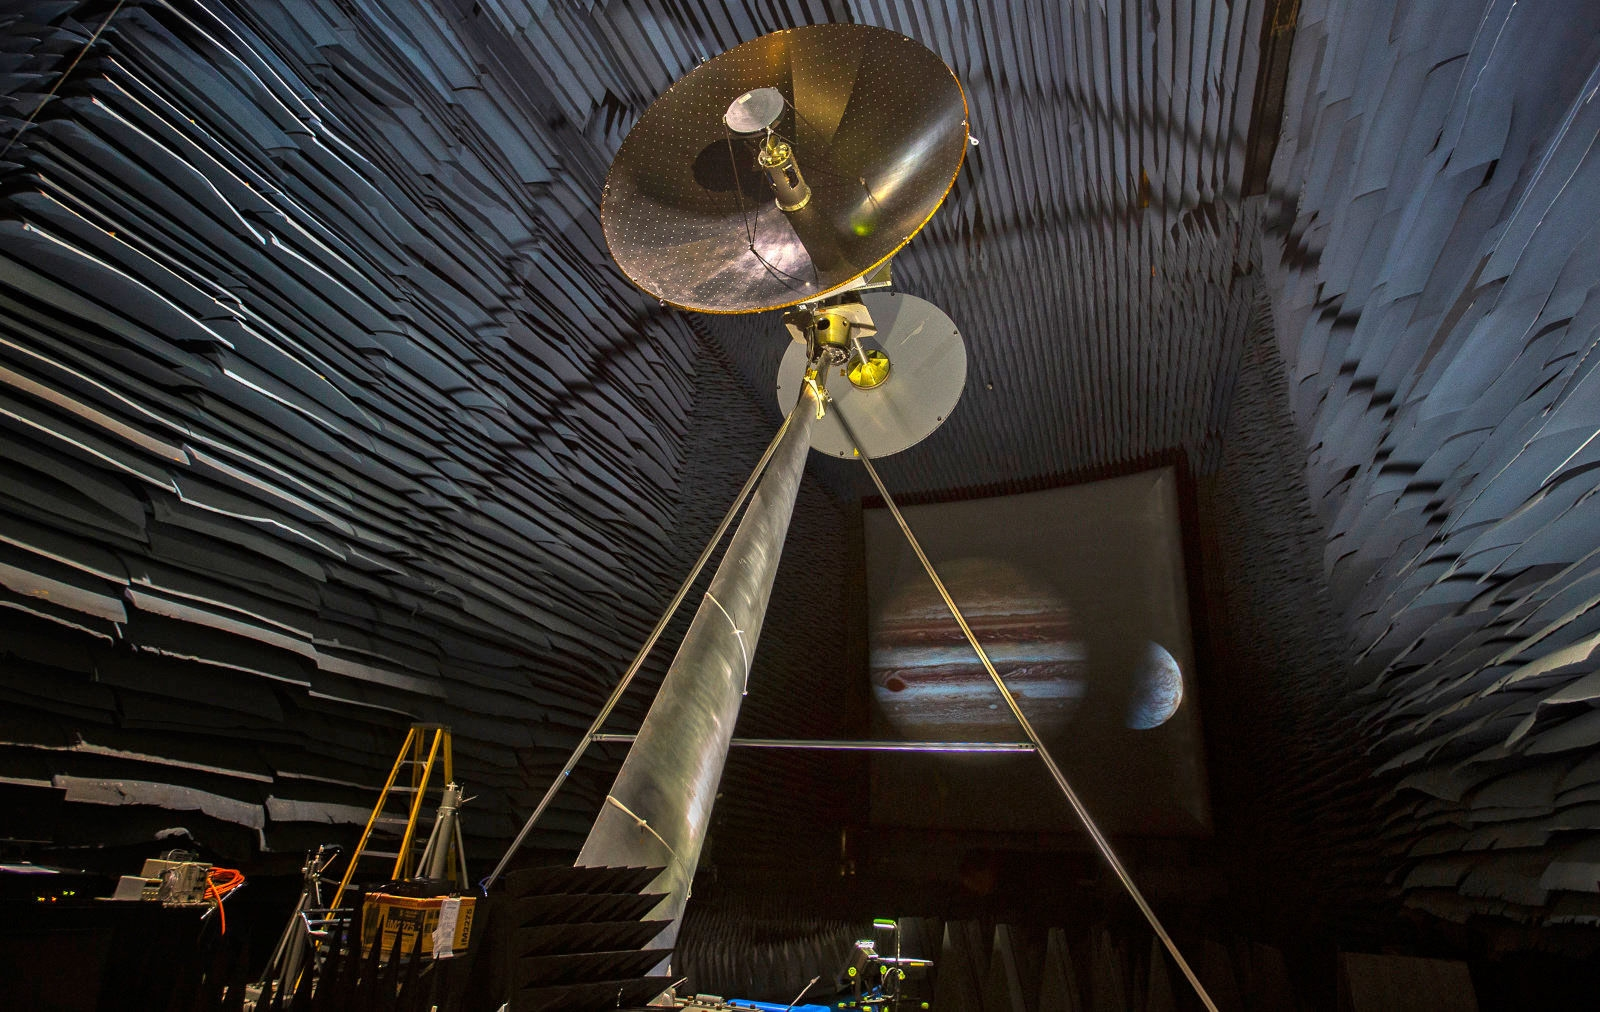 NASA is testing Jupiter moon probe's data-beaming antenna | DeviceDaily.com